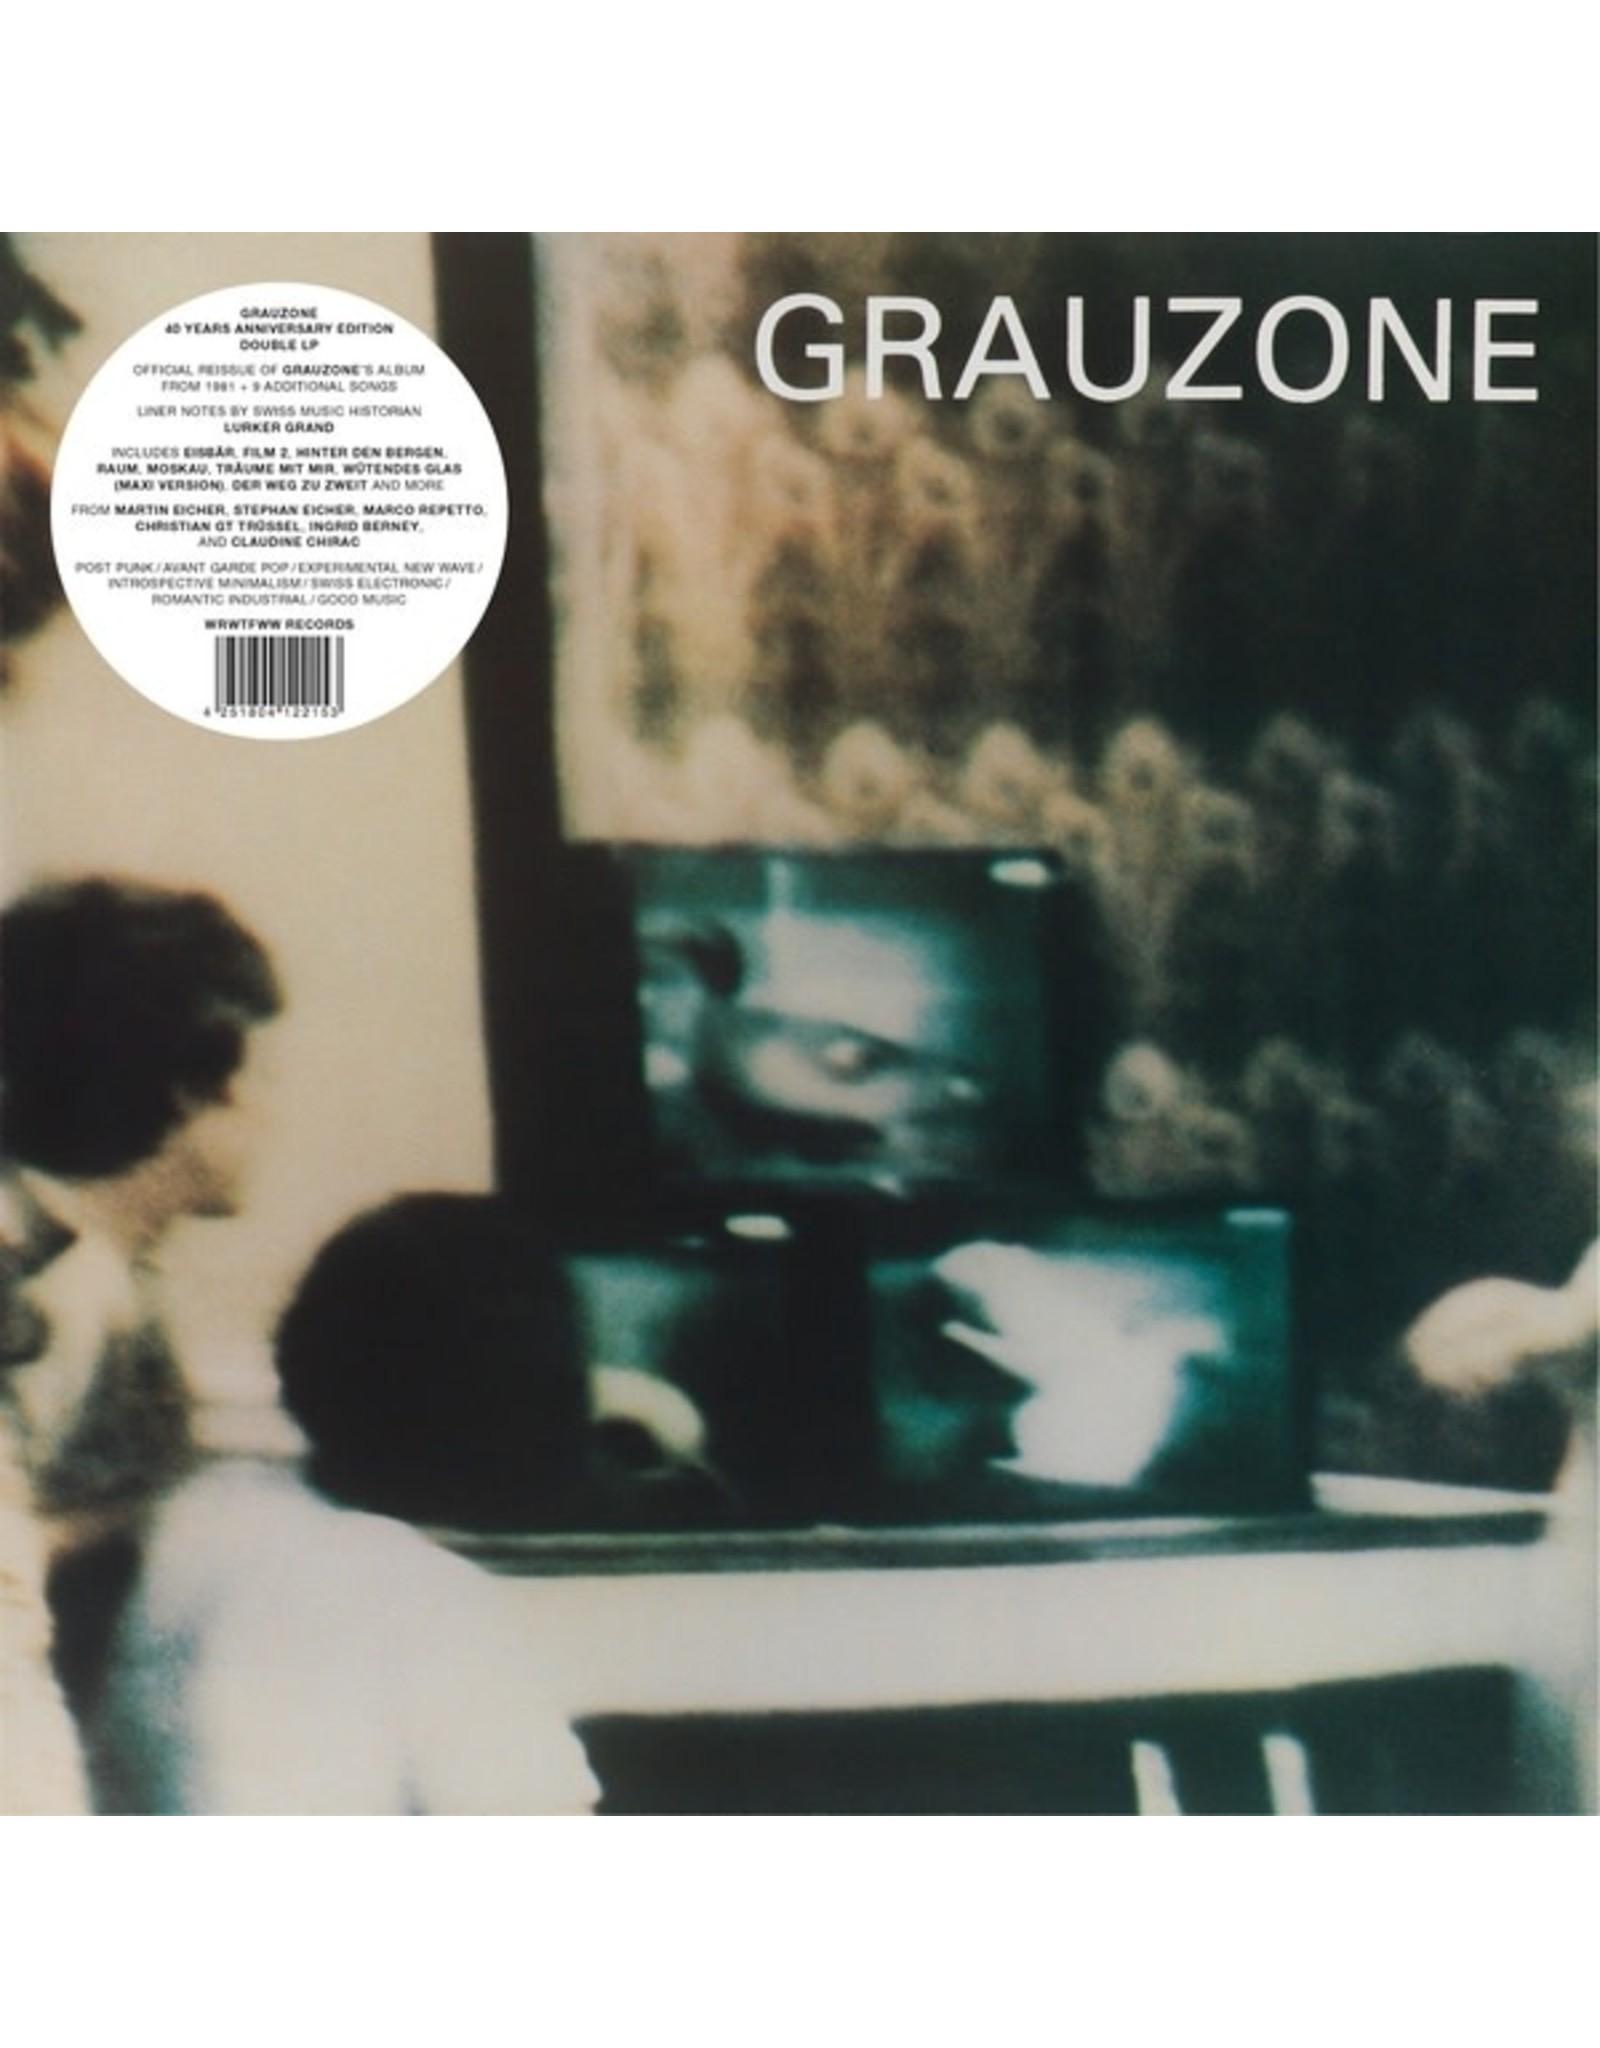 New Vinyl Grauzone - S/T (40 Years Anniversary Edition) LP